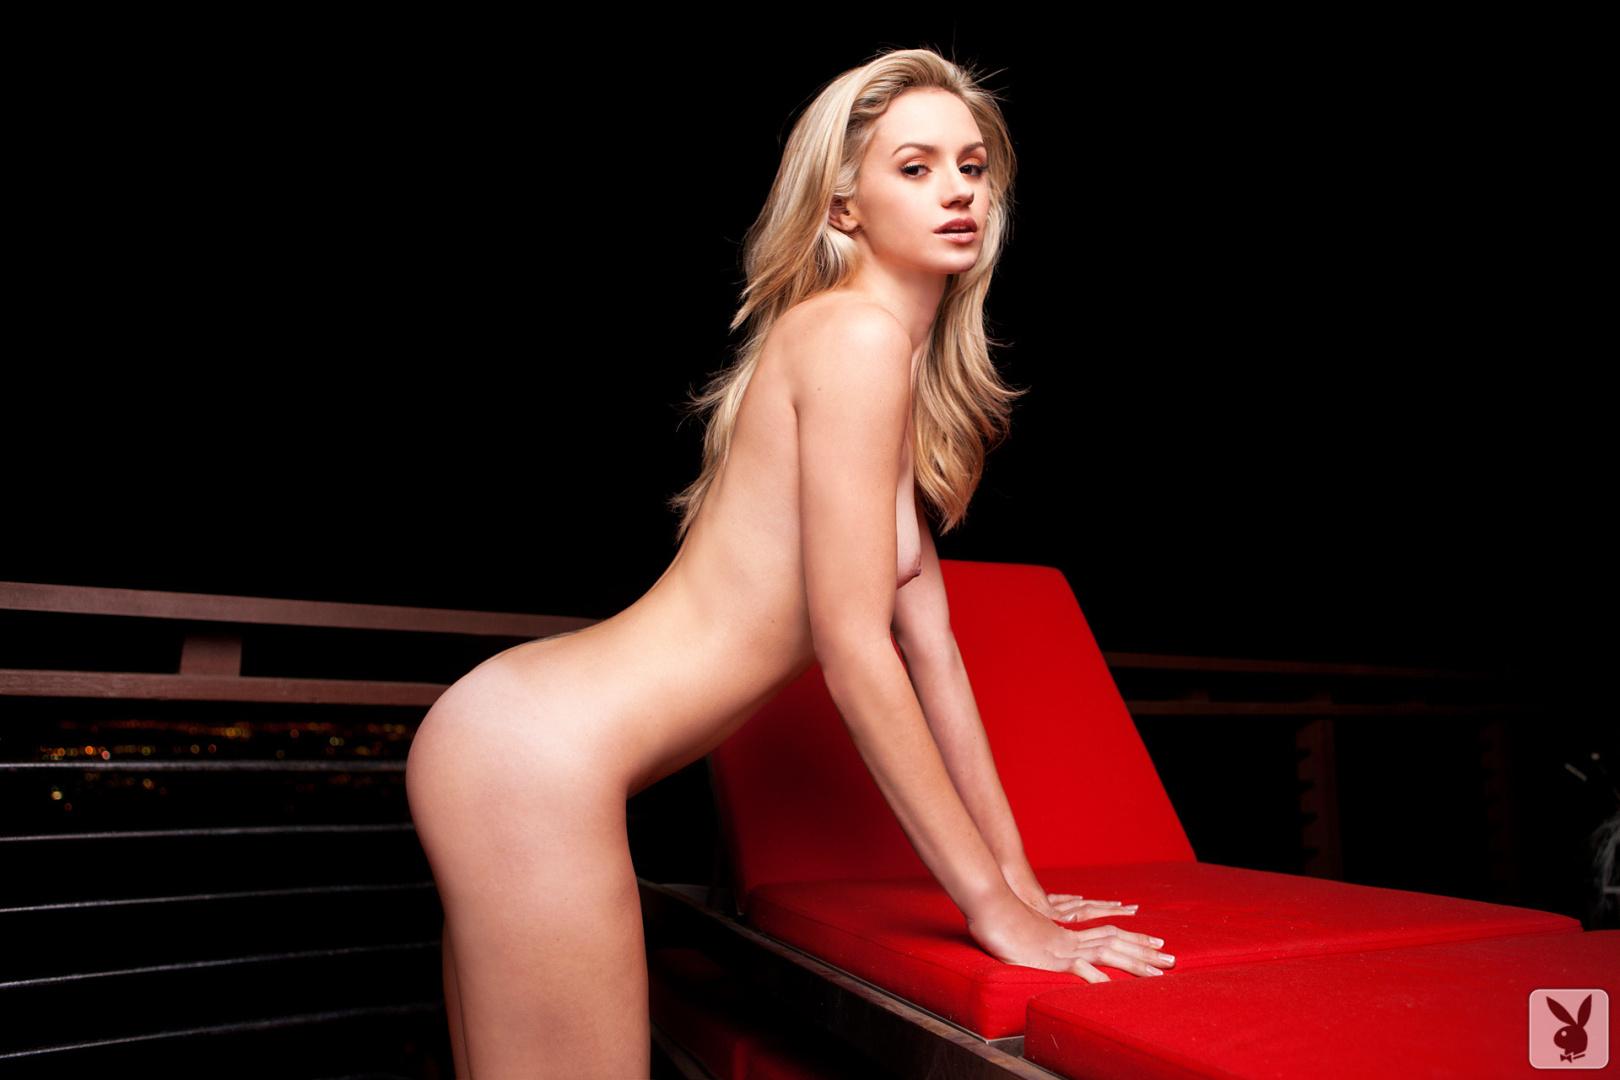 Aleana Koxx Porn playboy chloe miranda chloe miranda 49498 - good sex porn